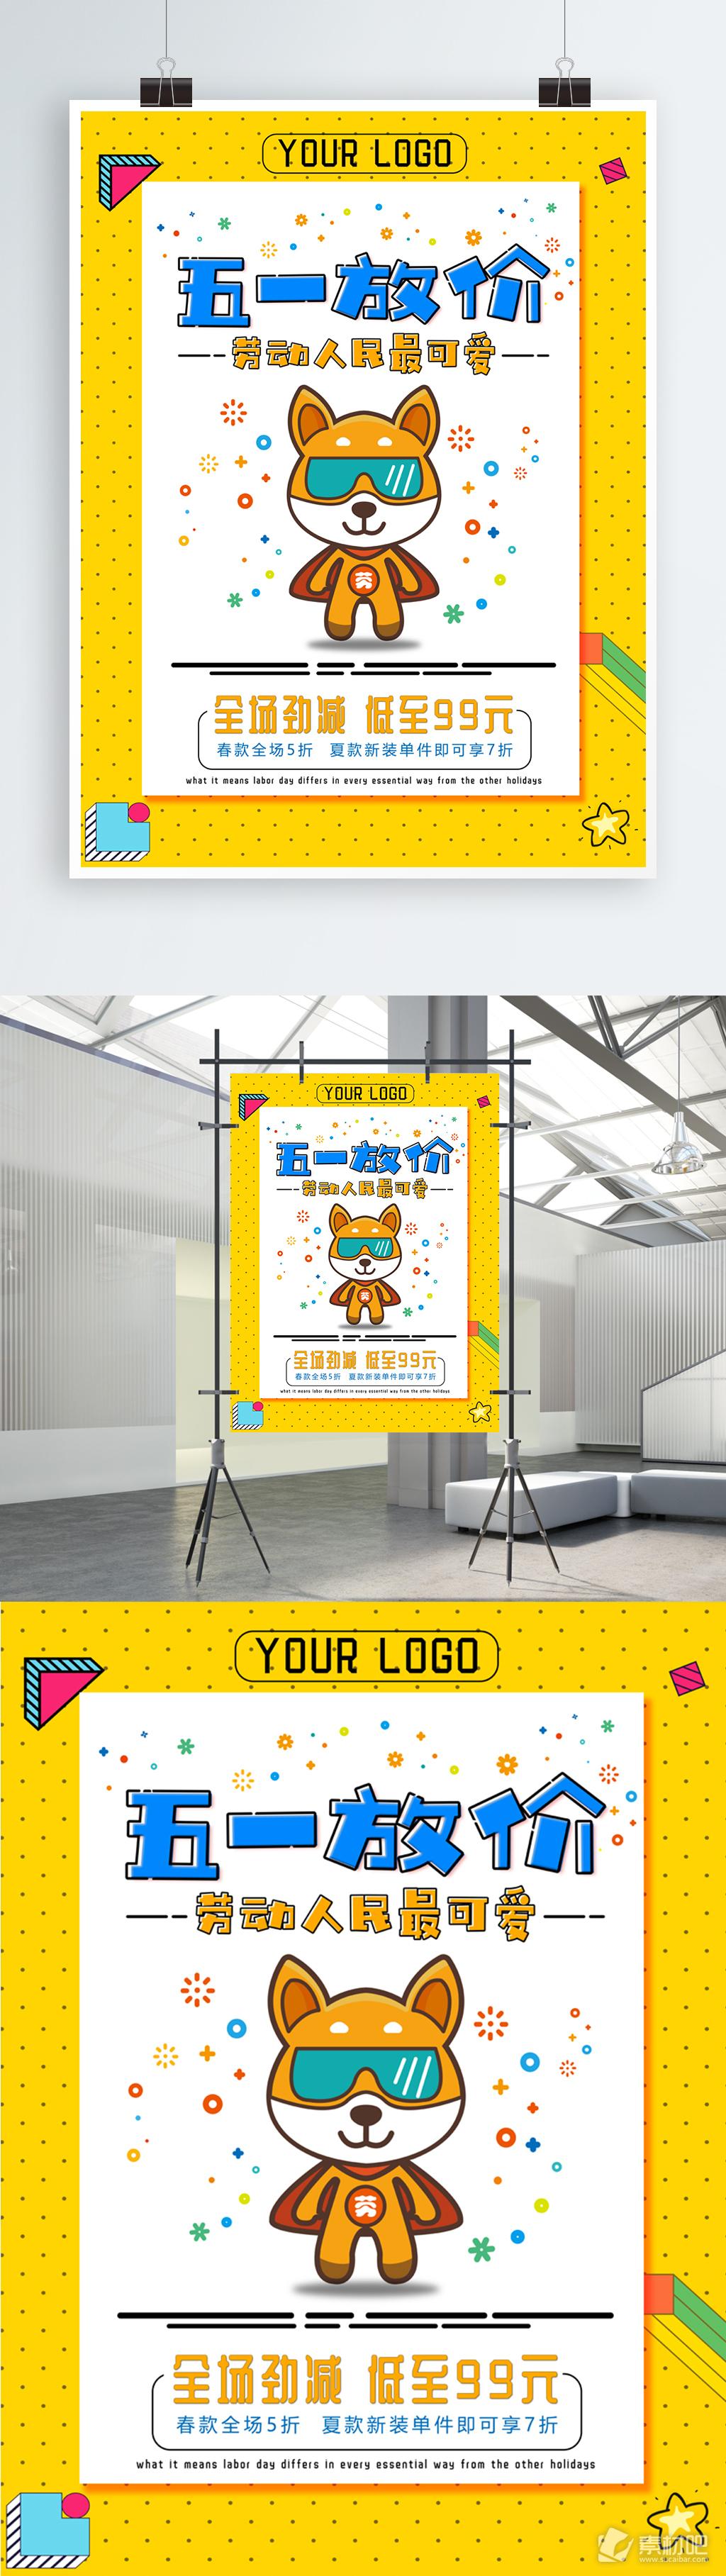 MBE风格卡通可爱劳动节促销宣传海报